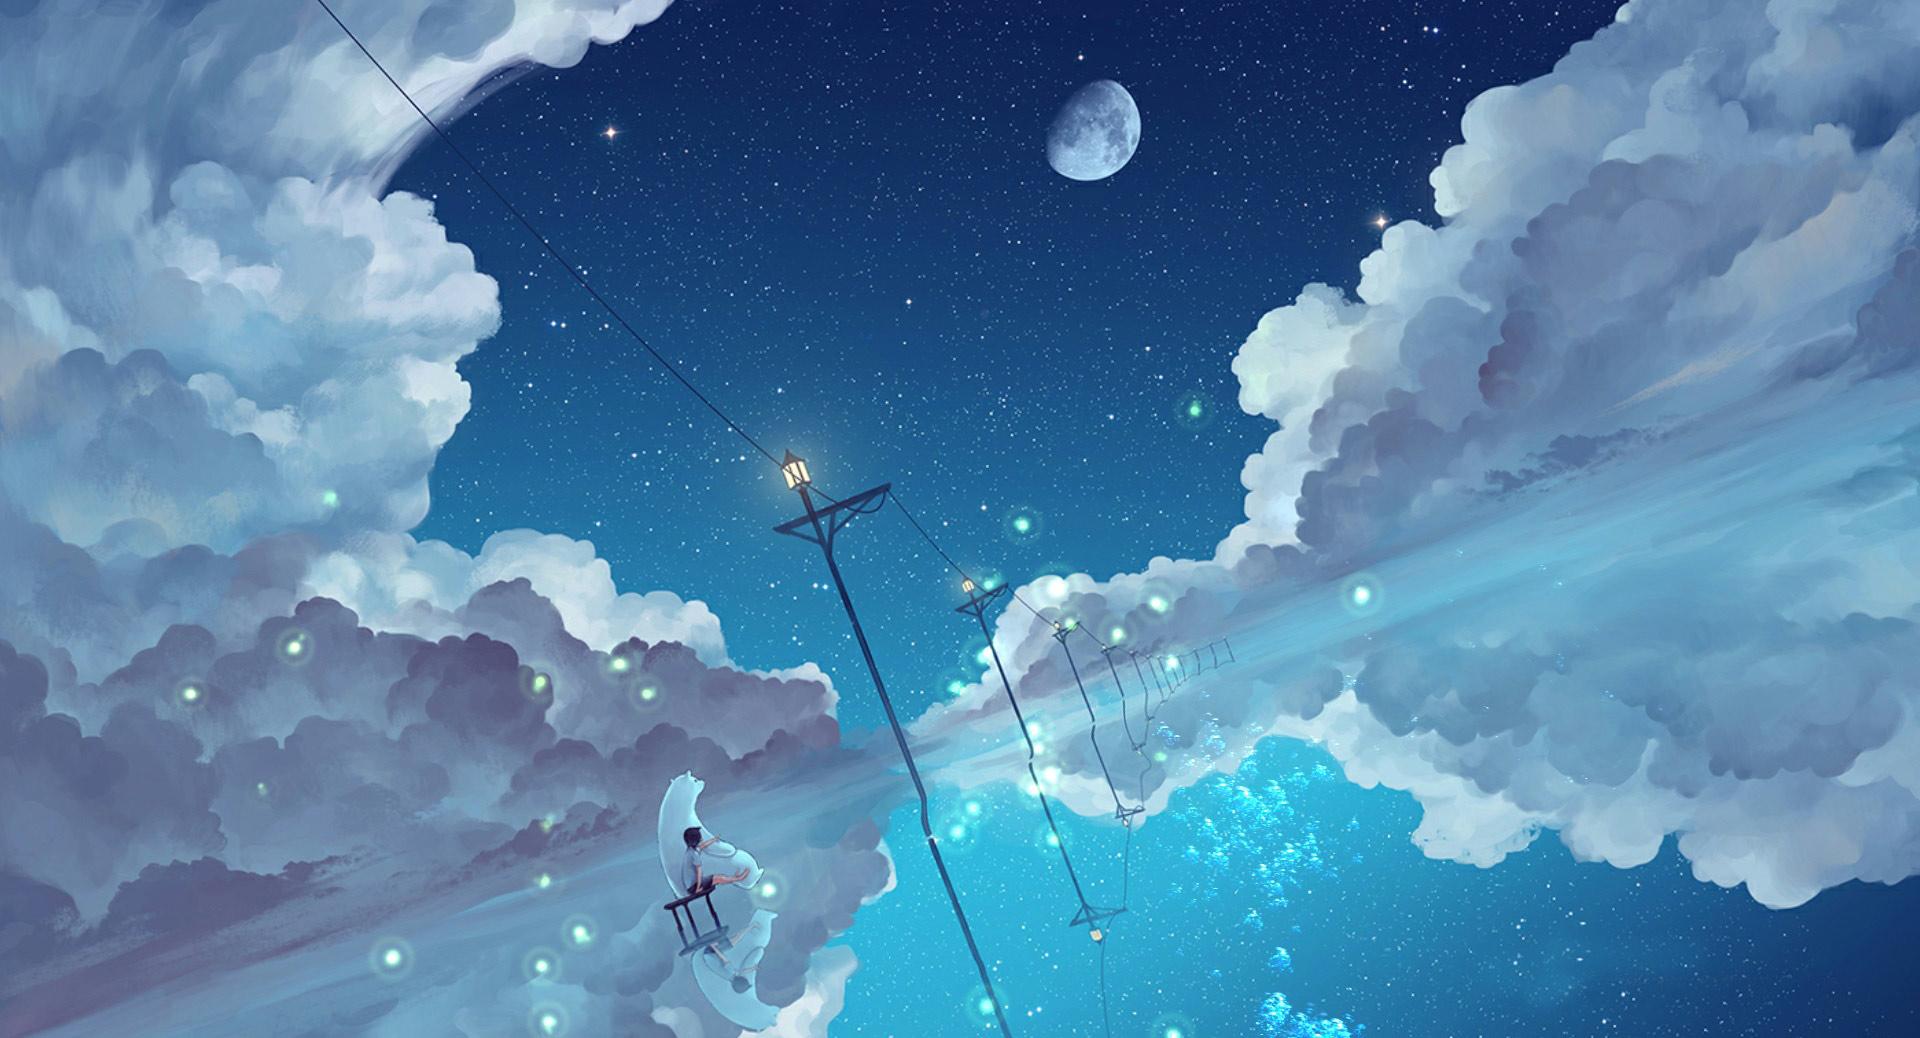 Polar Bear Boy Starry Night Sky Animated Wallpaper - Animated Live